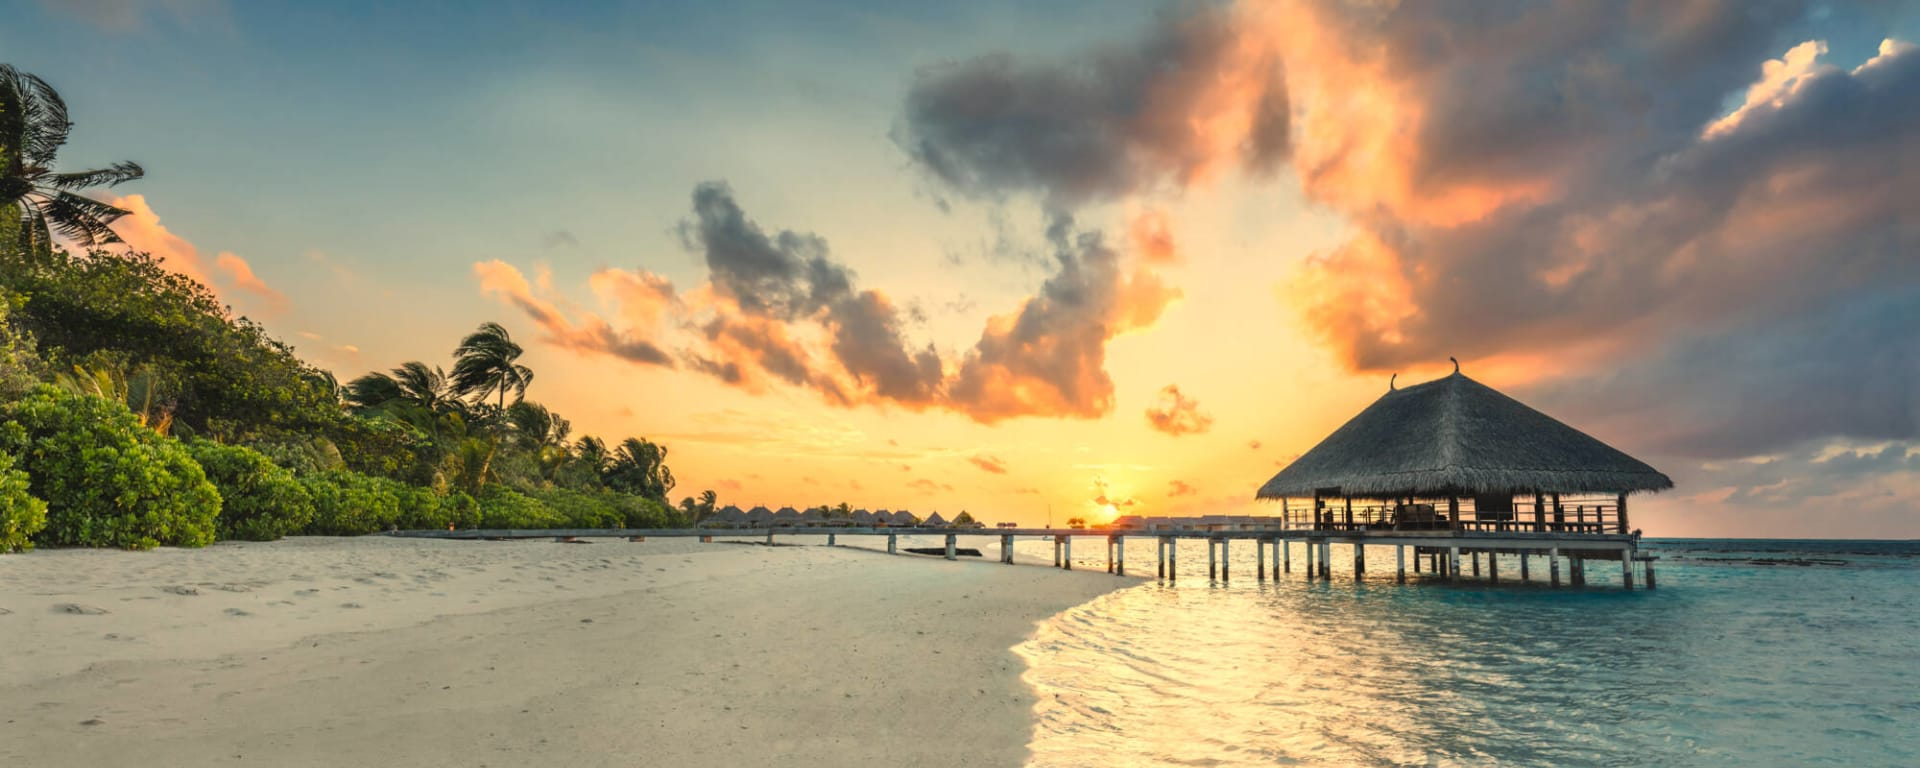 Malediven entdecken mit Tischler Reisen: Malediven Insel Bootsanleger im Sonnenuntergang